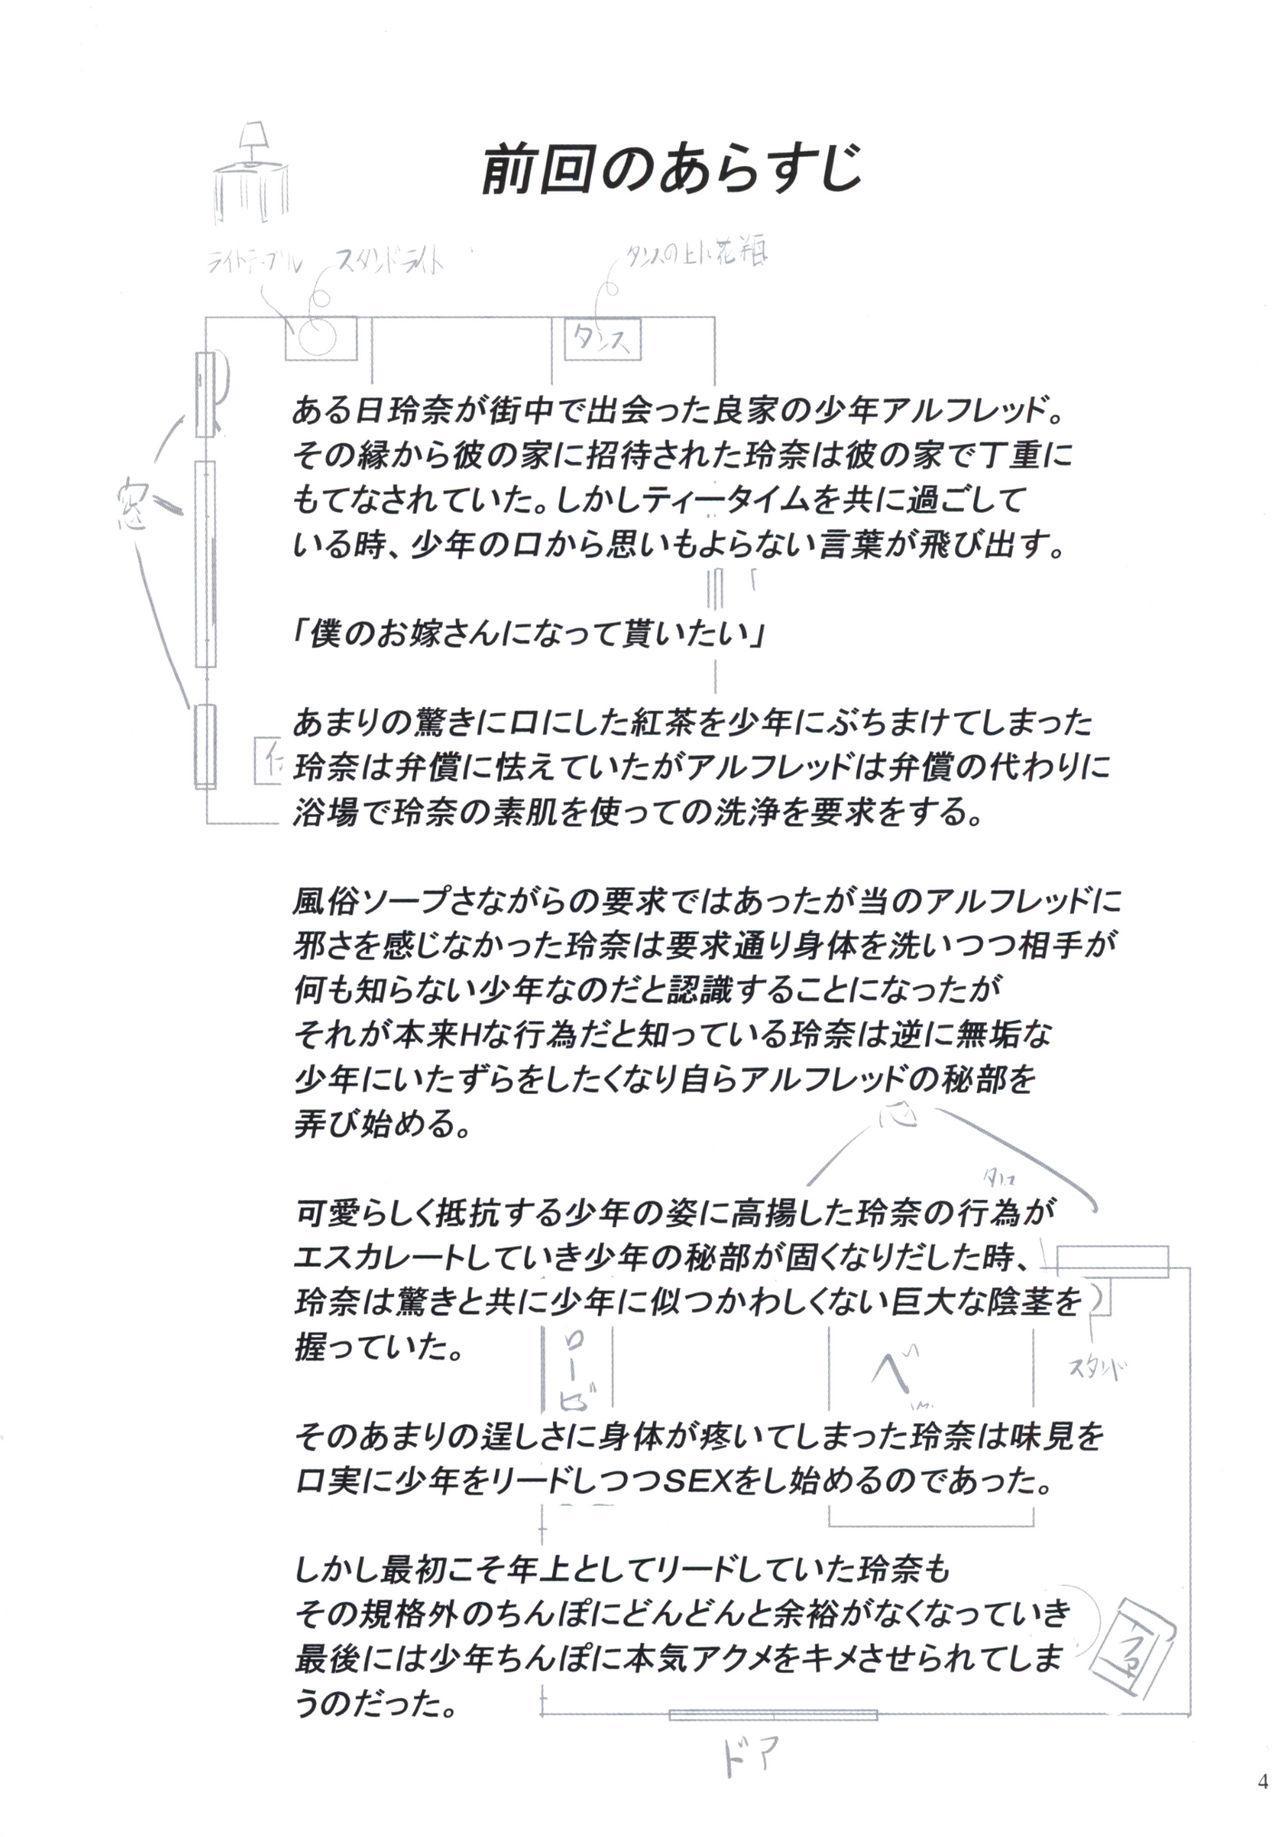 Gal Shota Cinderella 2 2